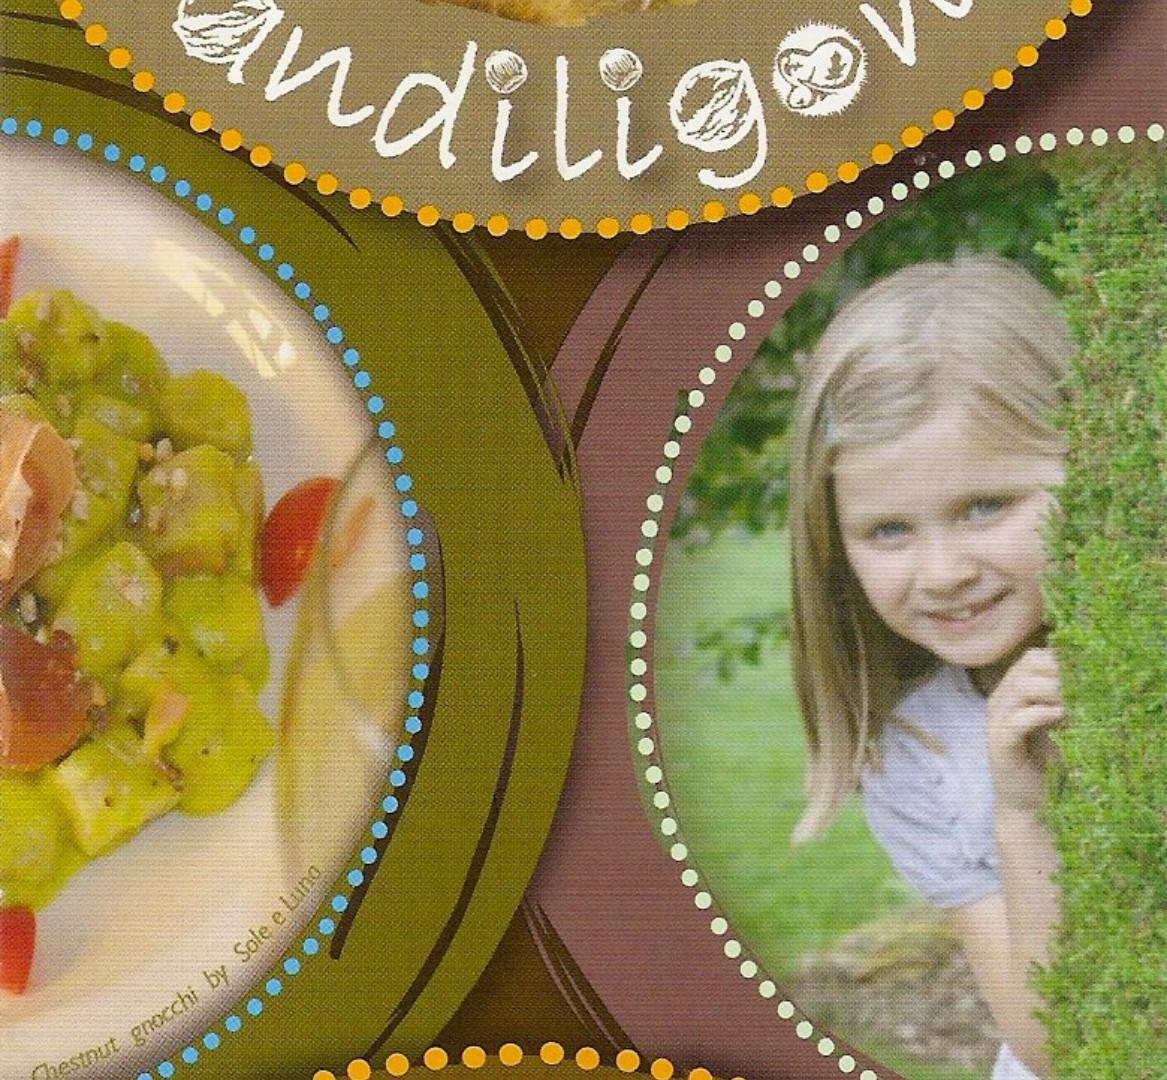 Wandi nut Festival Festival 2010 Program